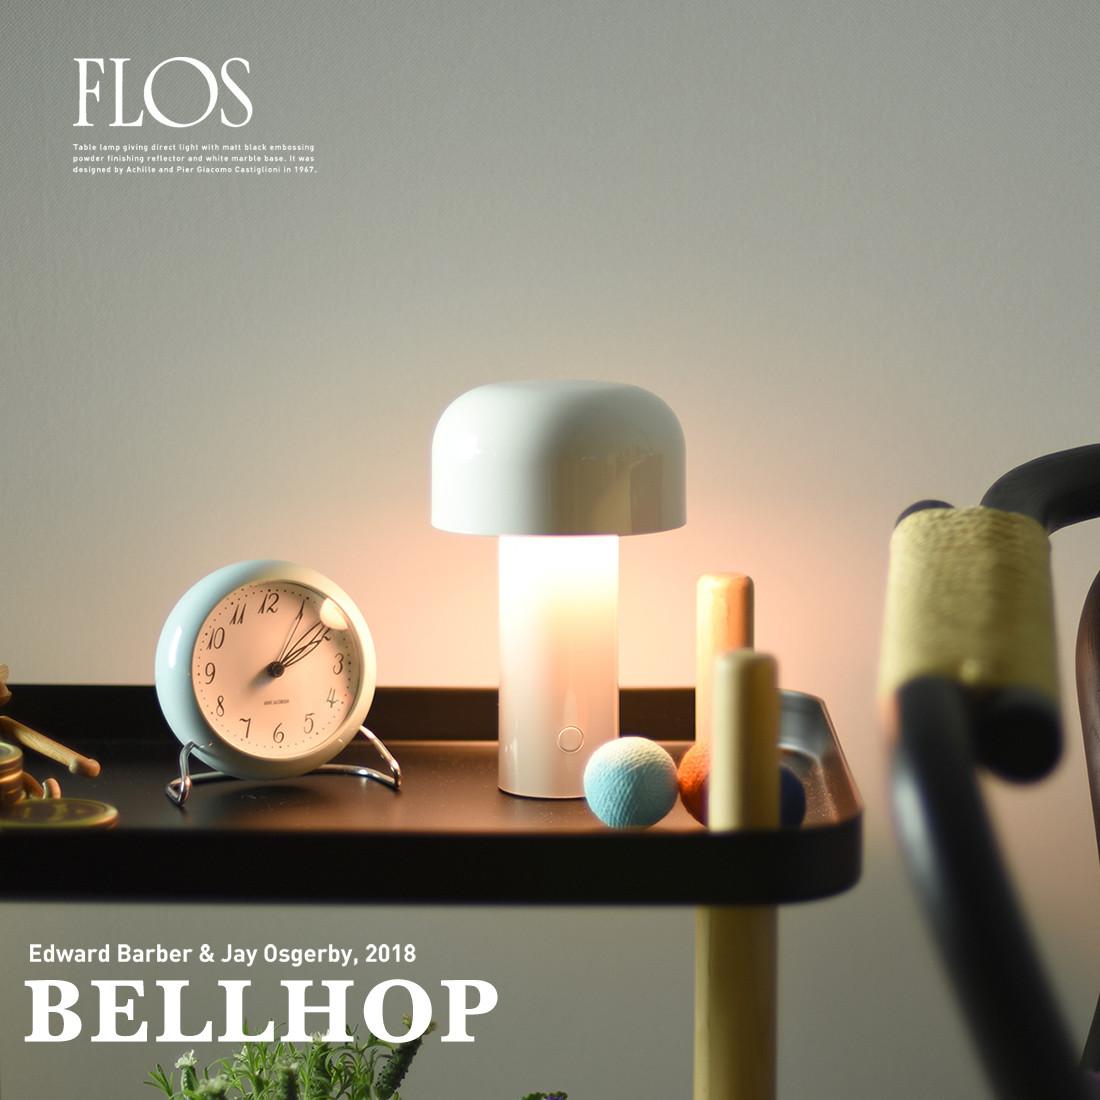 【FLOS フロス】 Bellhop ベルホップEdward Barber & Jay Osgerby テーブルランプ ライト 照明 デザイナーズ スタンド ペンダント テーブル 【代引き不可】